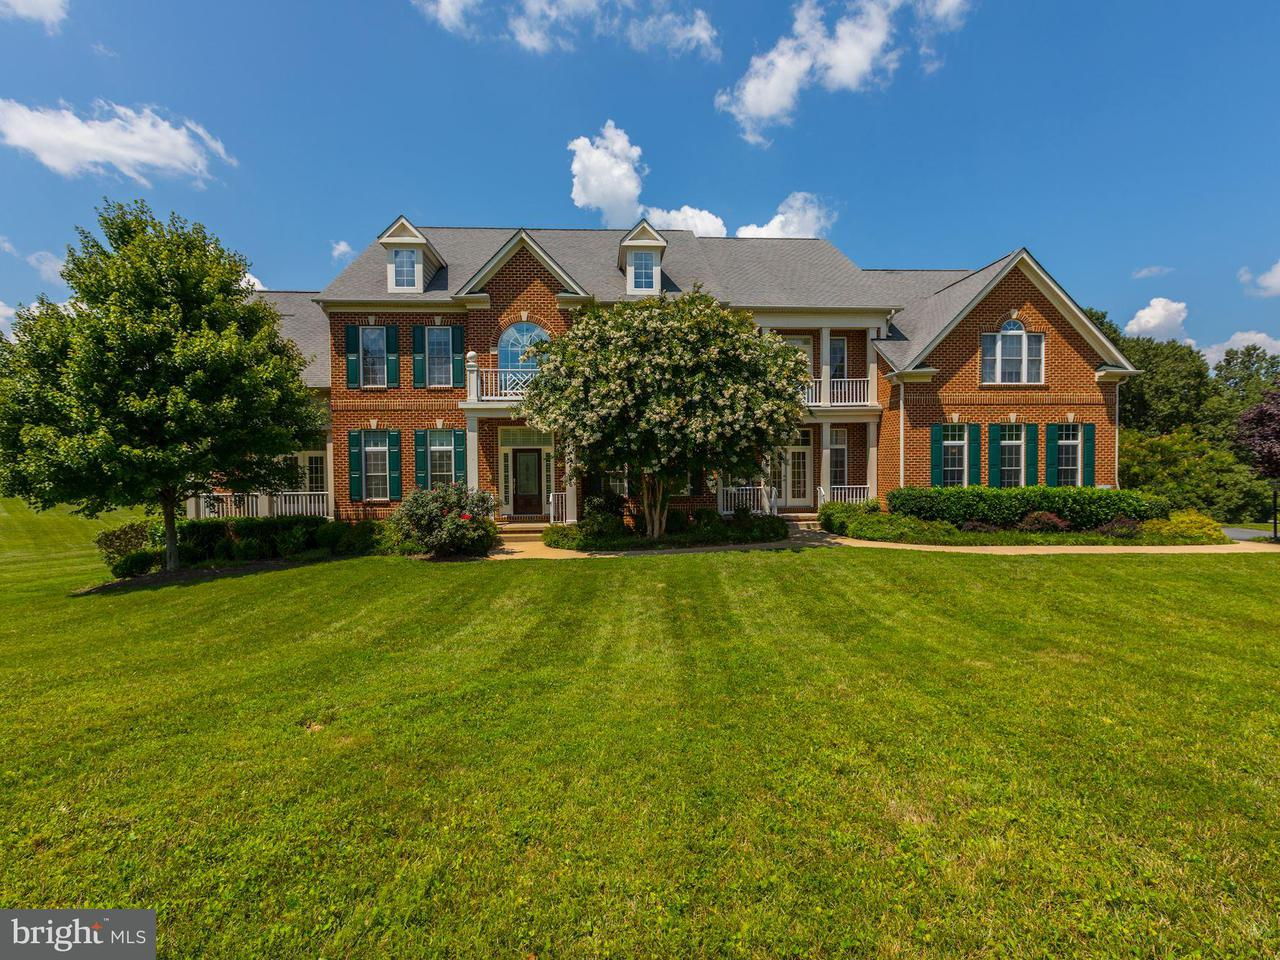 独户住宅 为 销售 在 24006 Burnt Hill Road 24006 Burnt Hill Road Clarksburg, 马里兰州 20871 美国